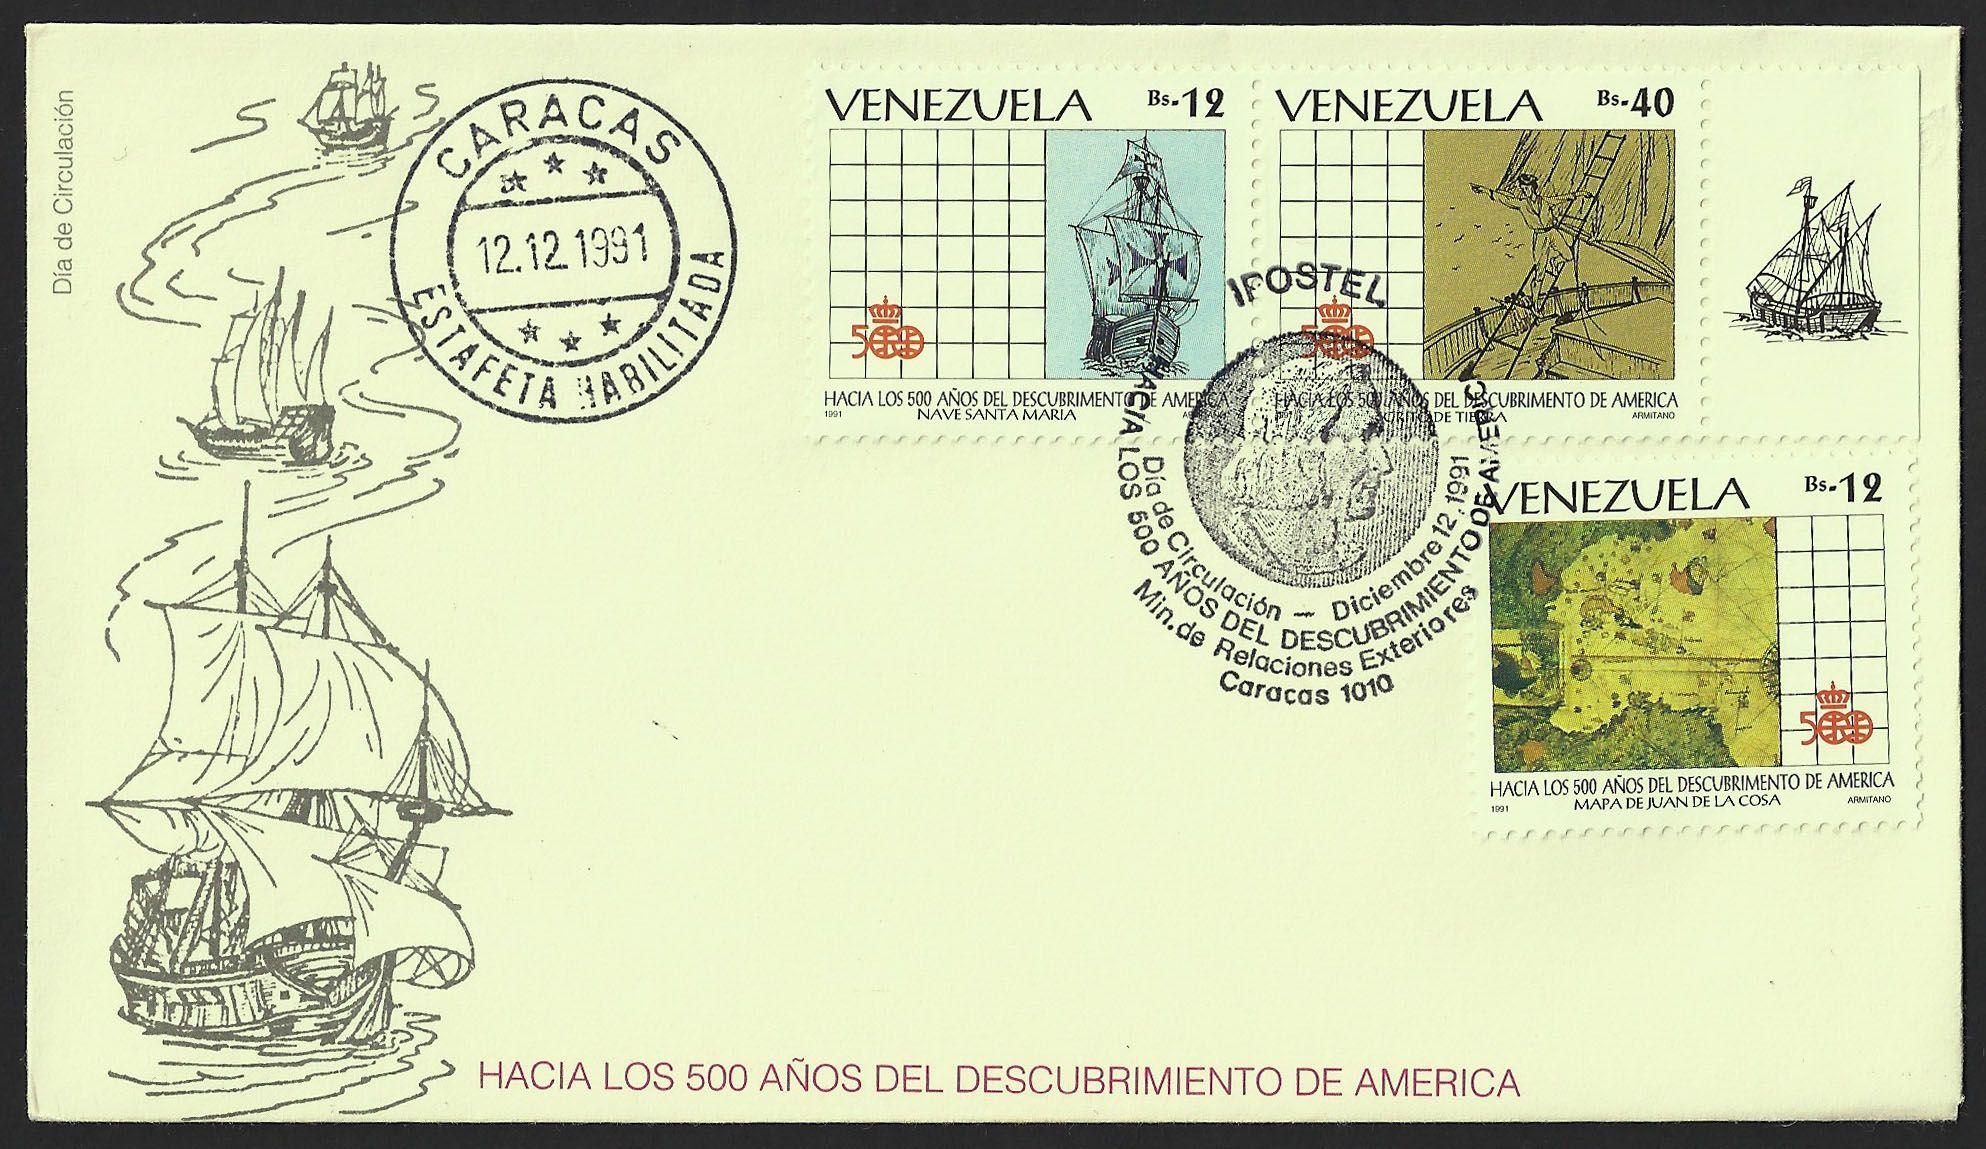 Venezuela First Day Cover Scott #1468b, #1468d, #1468c (12